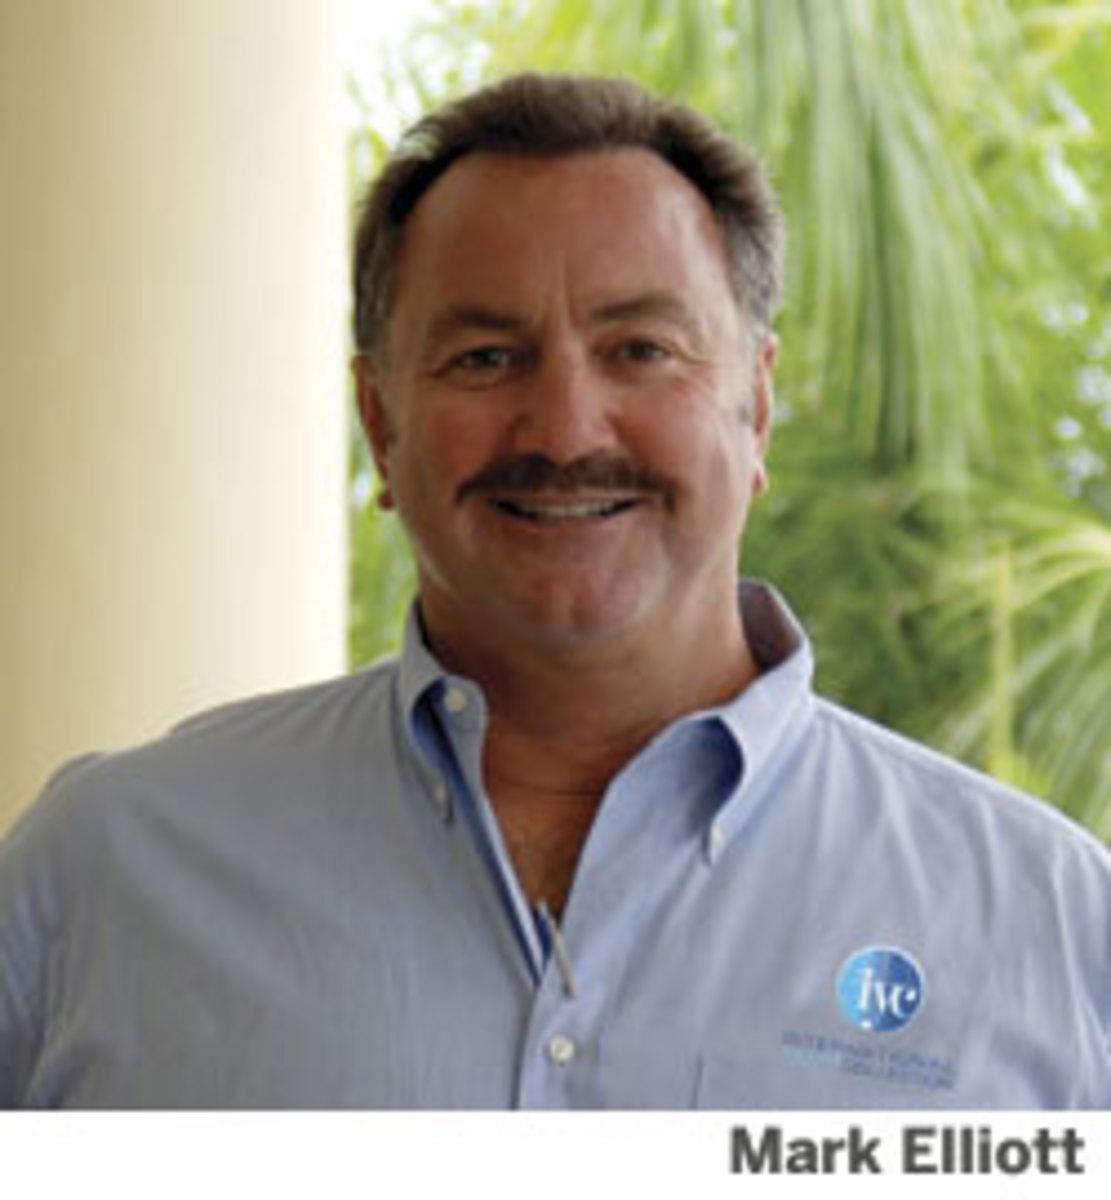 Mark Elliott, International Yacht Collection